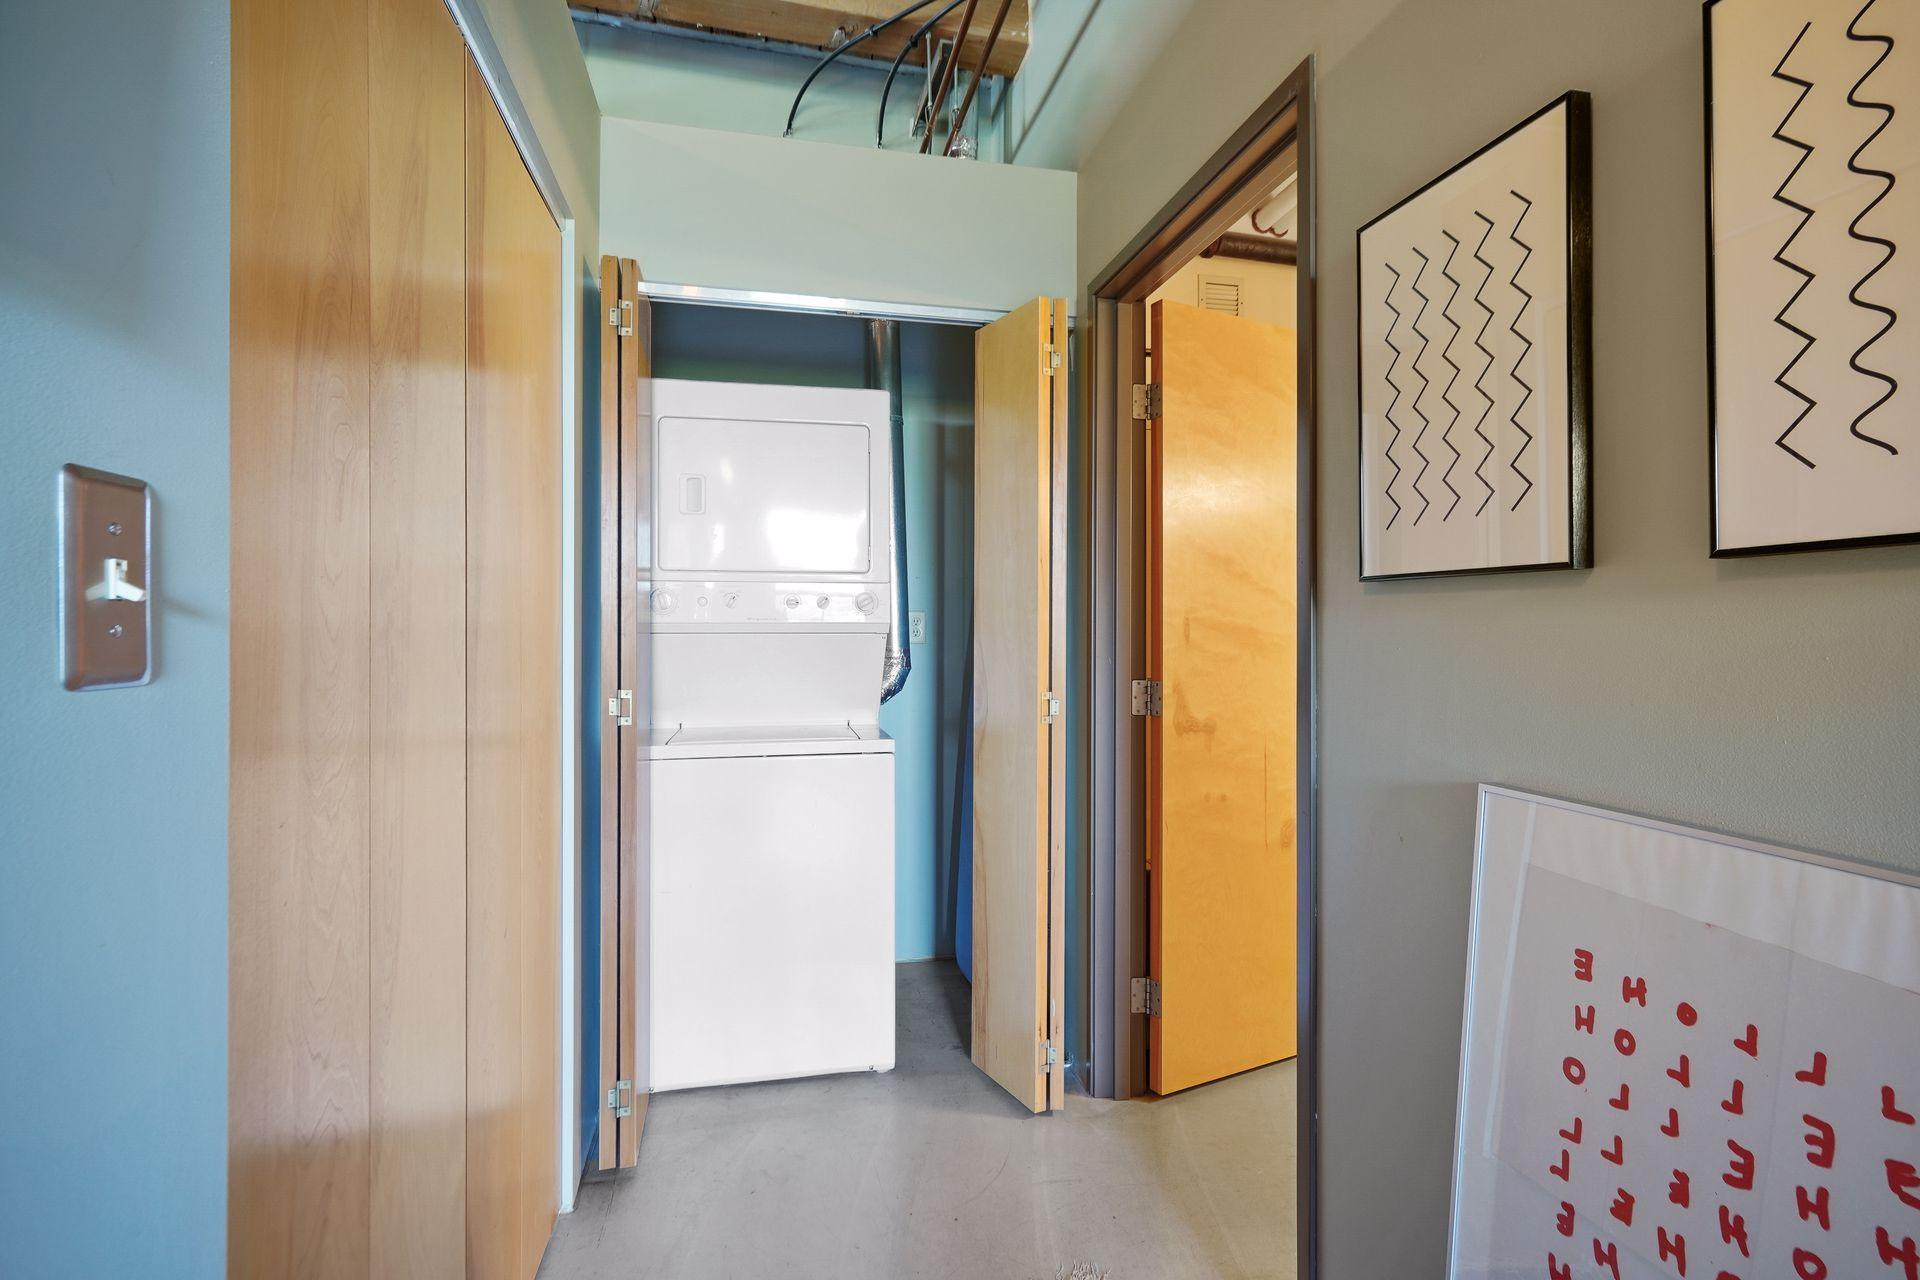 127 5th Street, Minneapolis, Minnesota 55413, 1 Bedroom Bedrooms, ,1 BathroomBathrooms,Residential,For Sale,5th,NST6075191